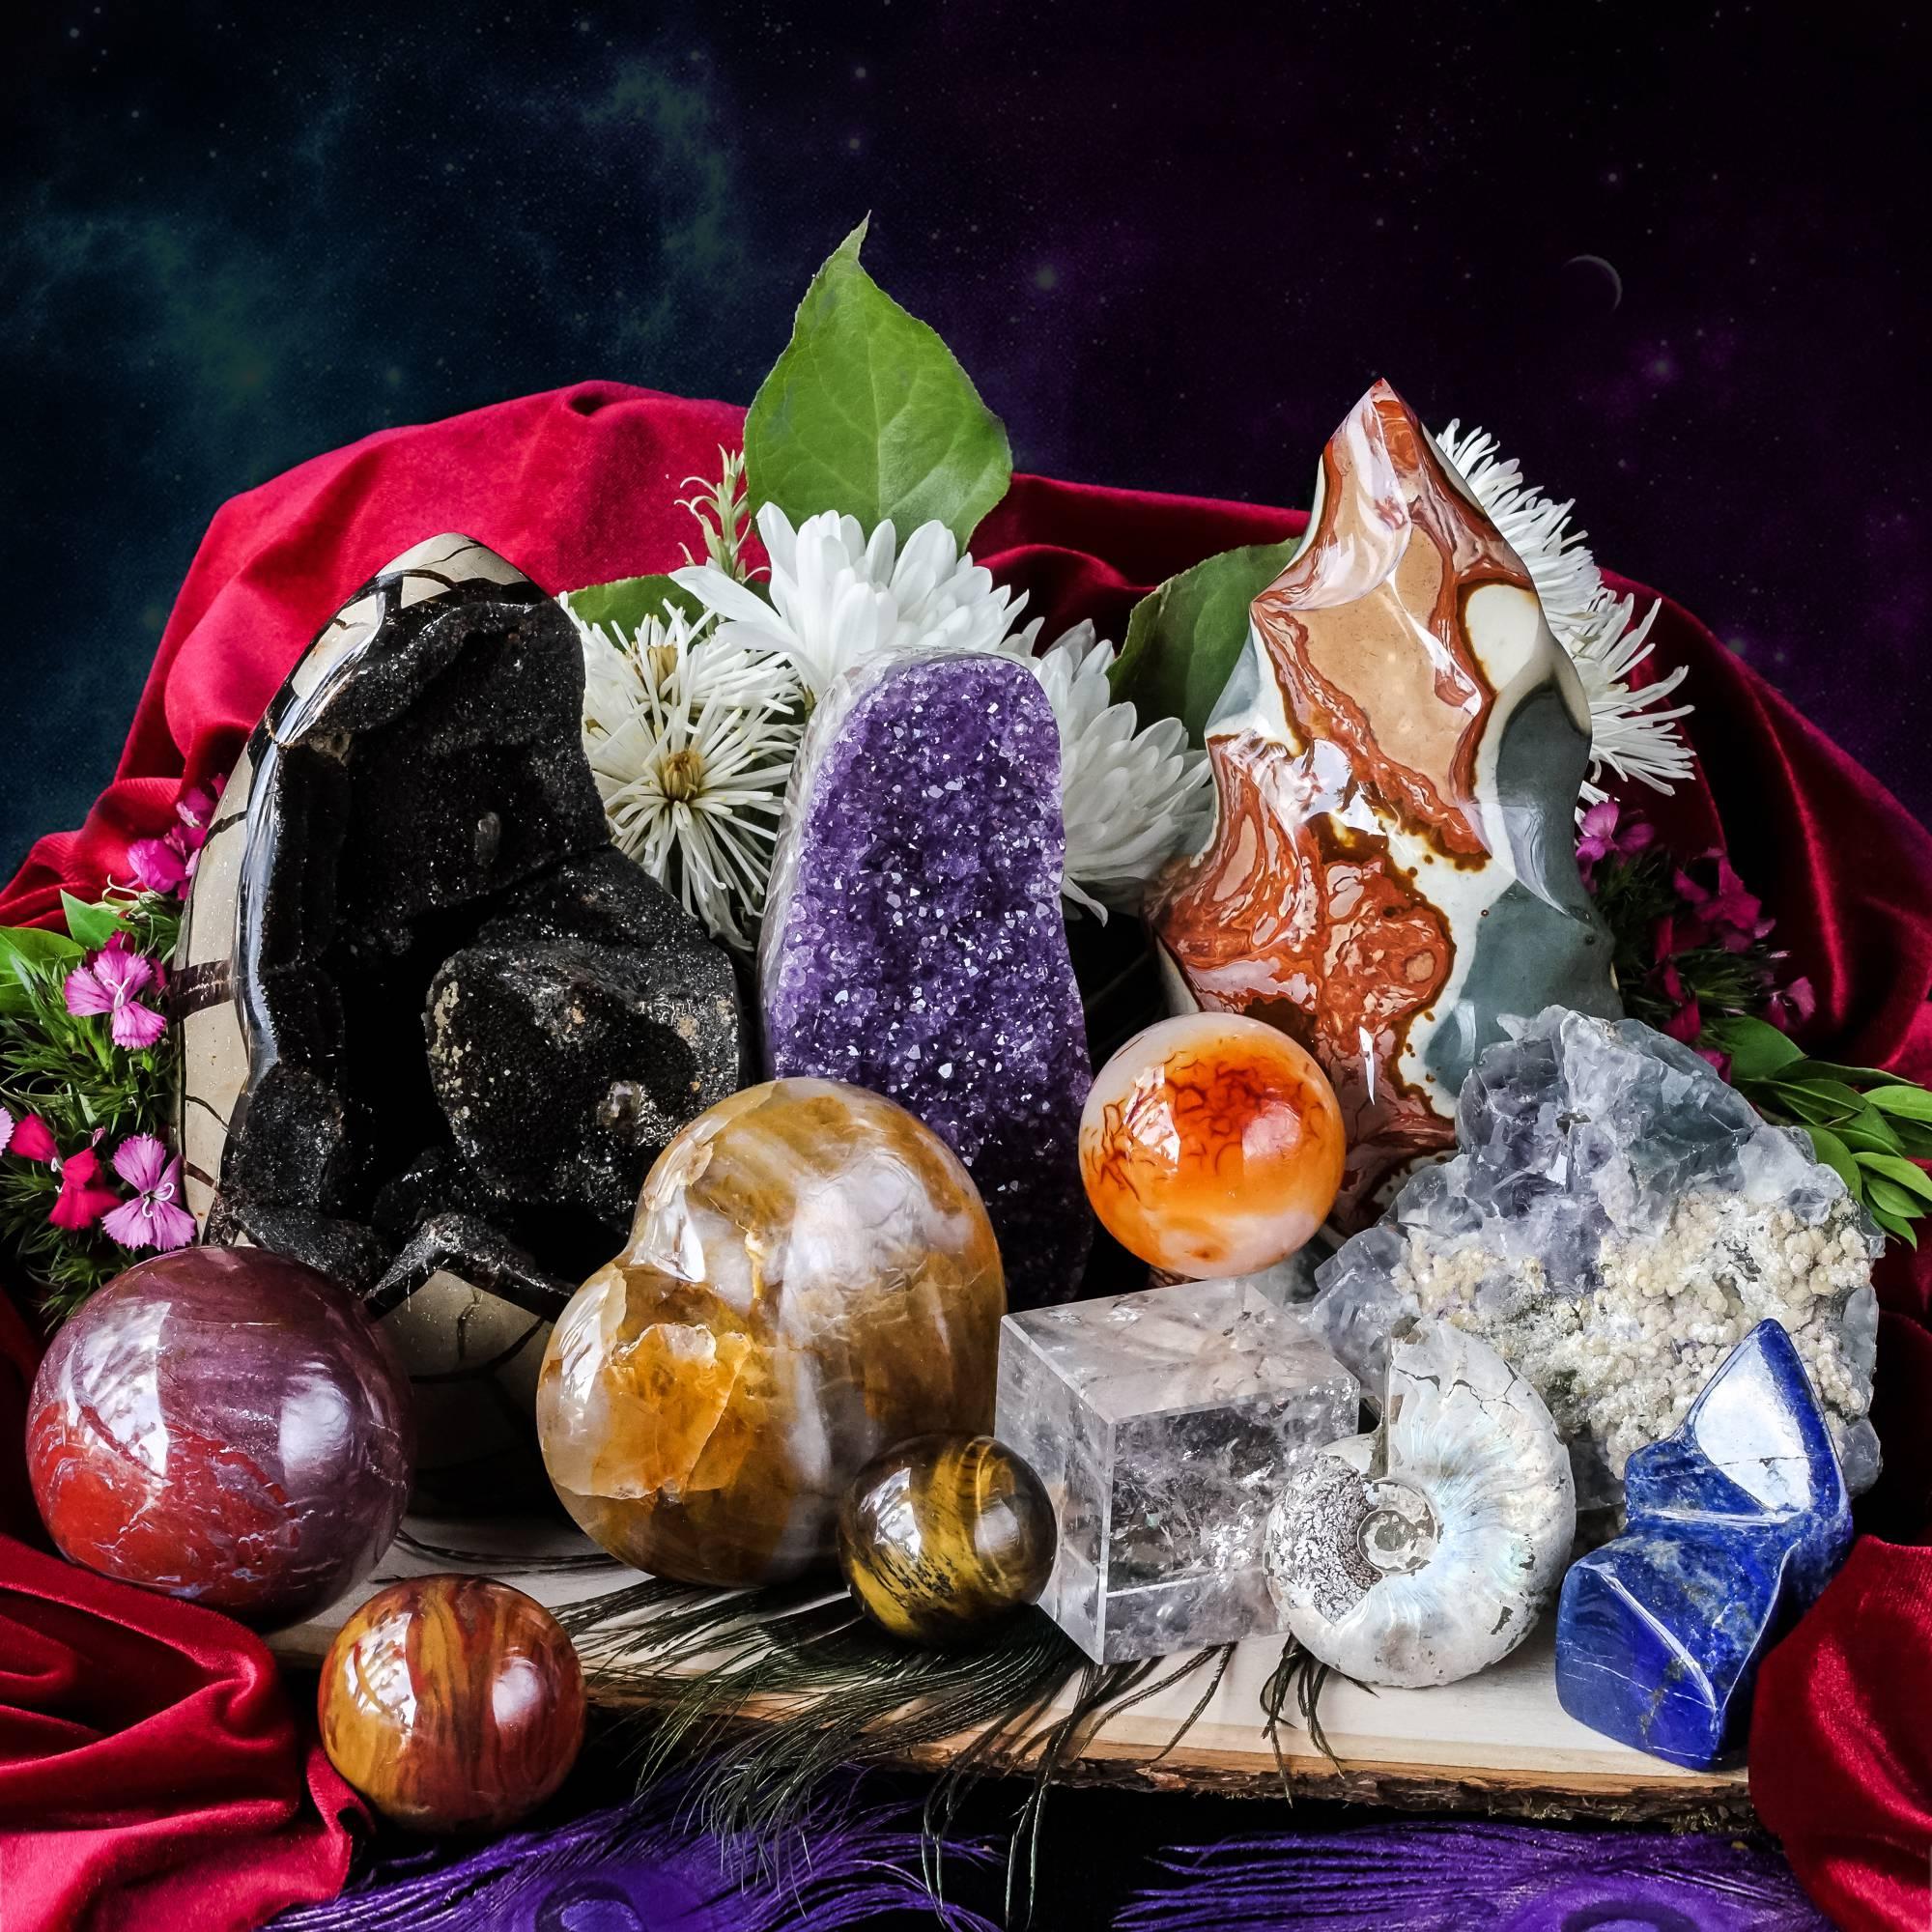 intuitively chosen gems